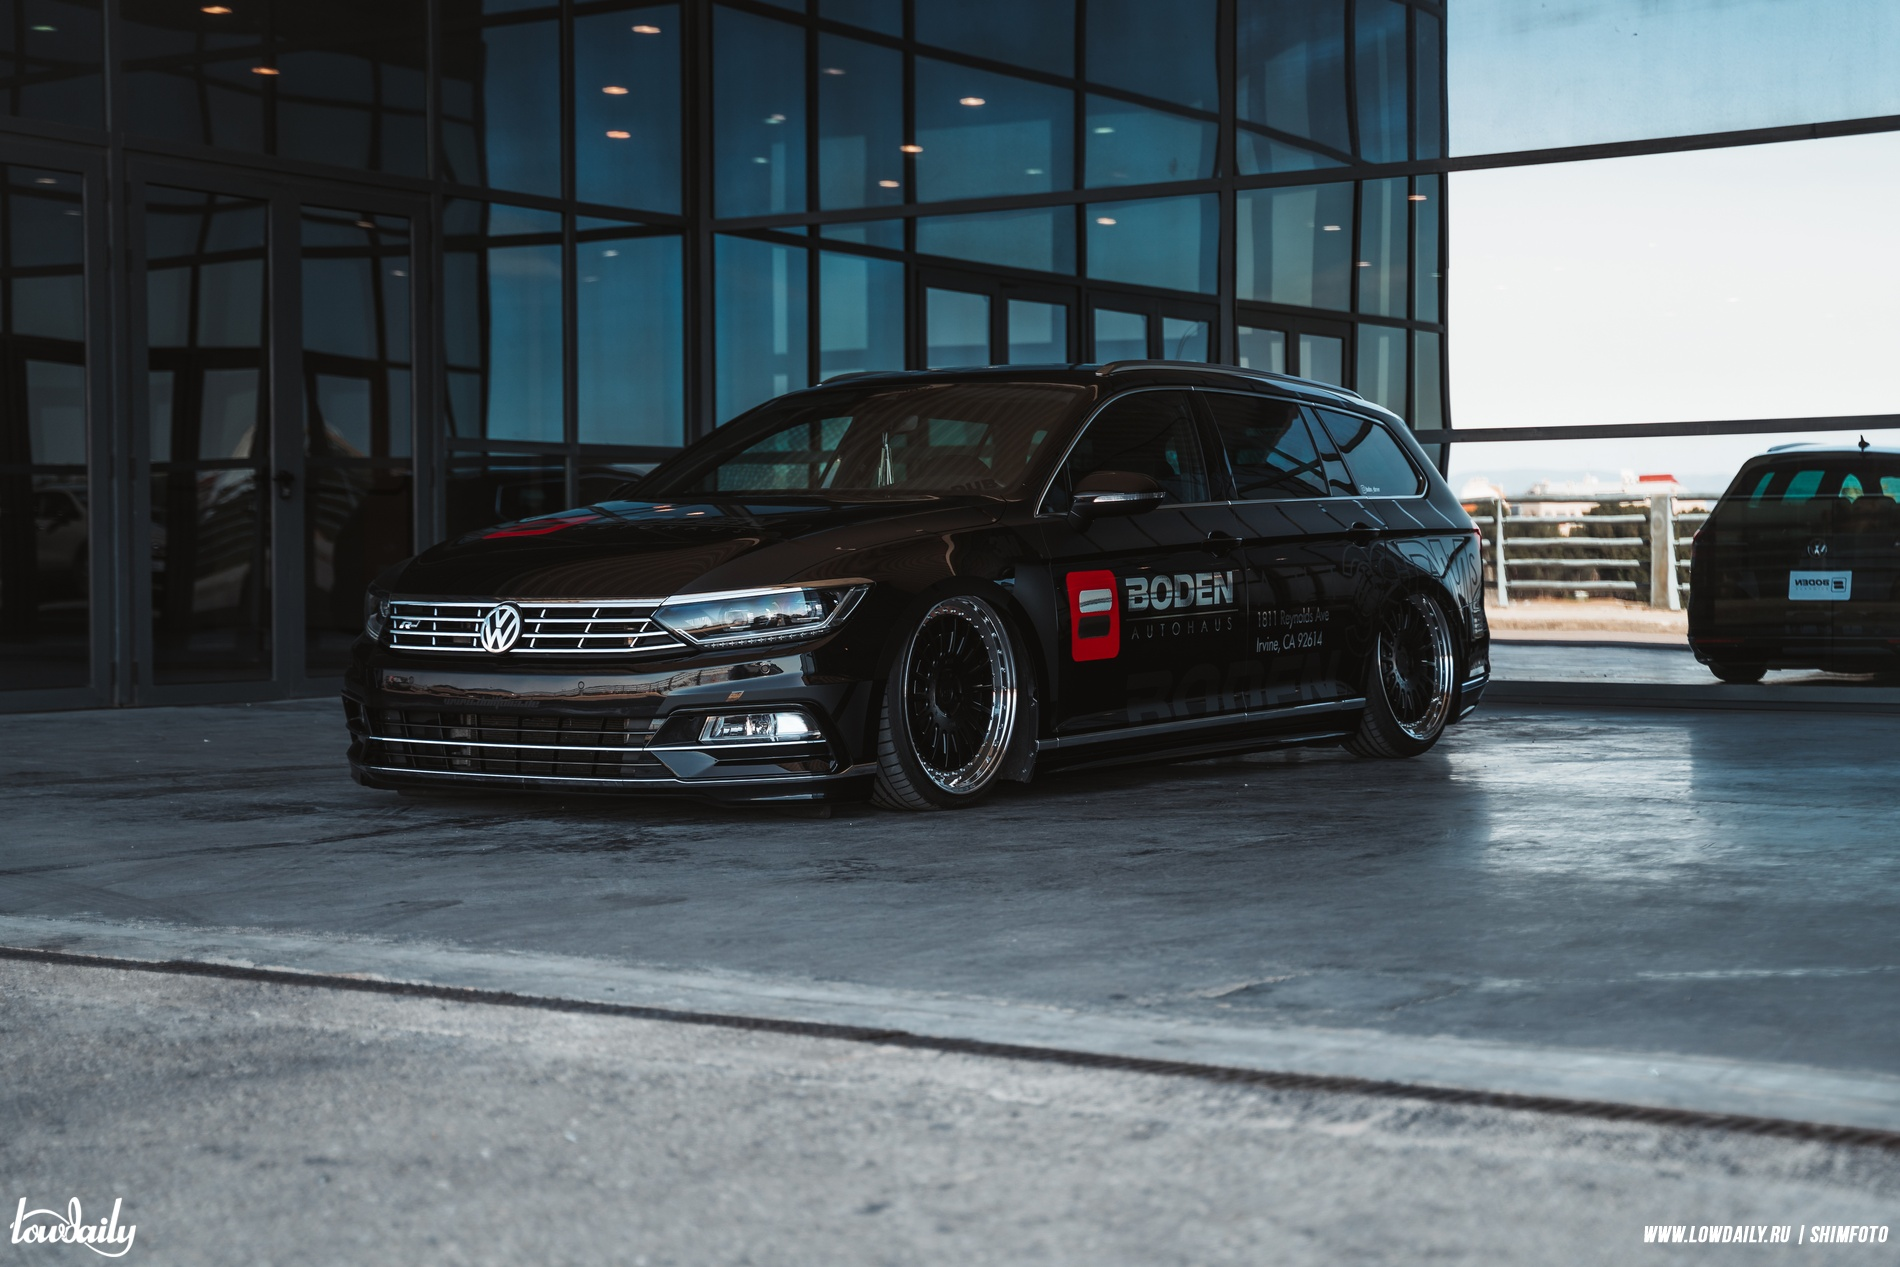 Volkswagen Passat - Boden Autohaus